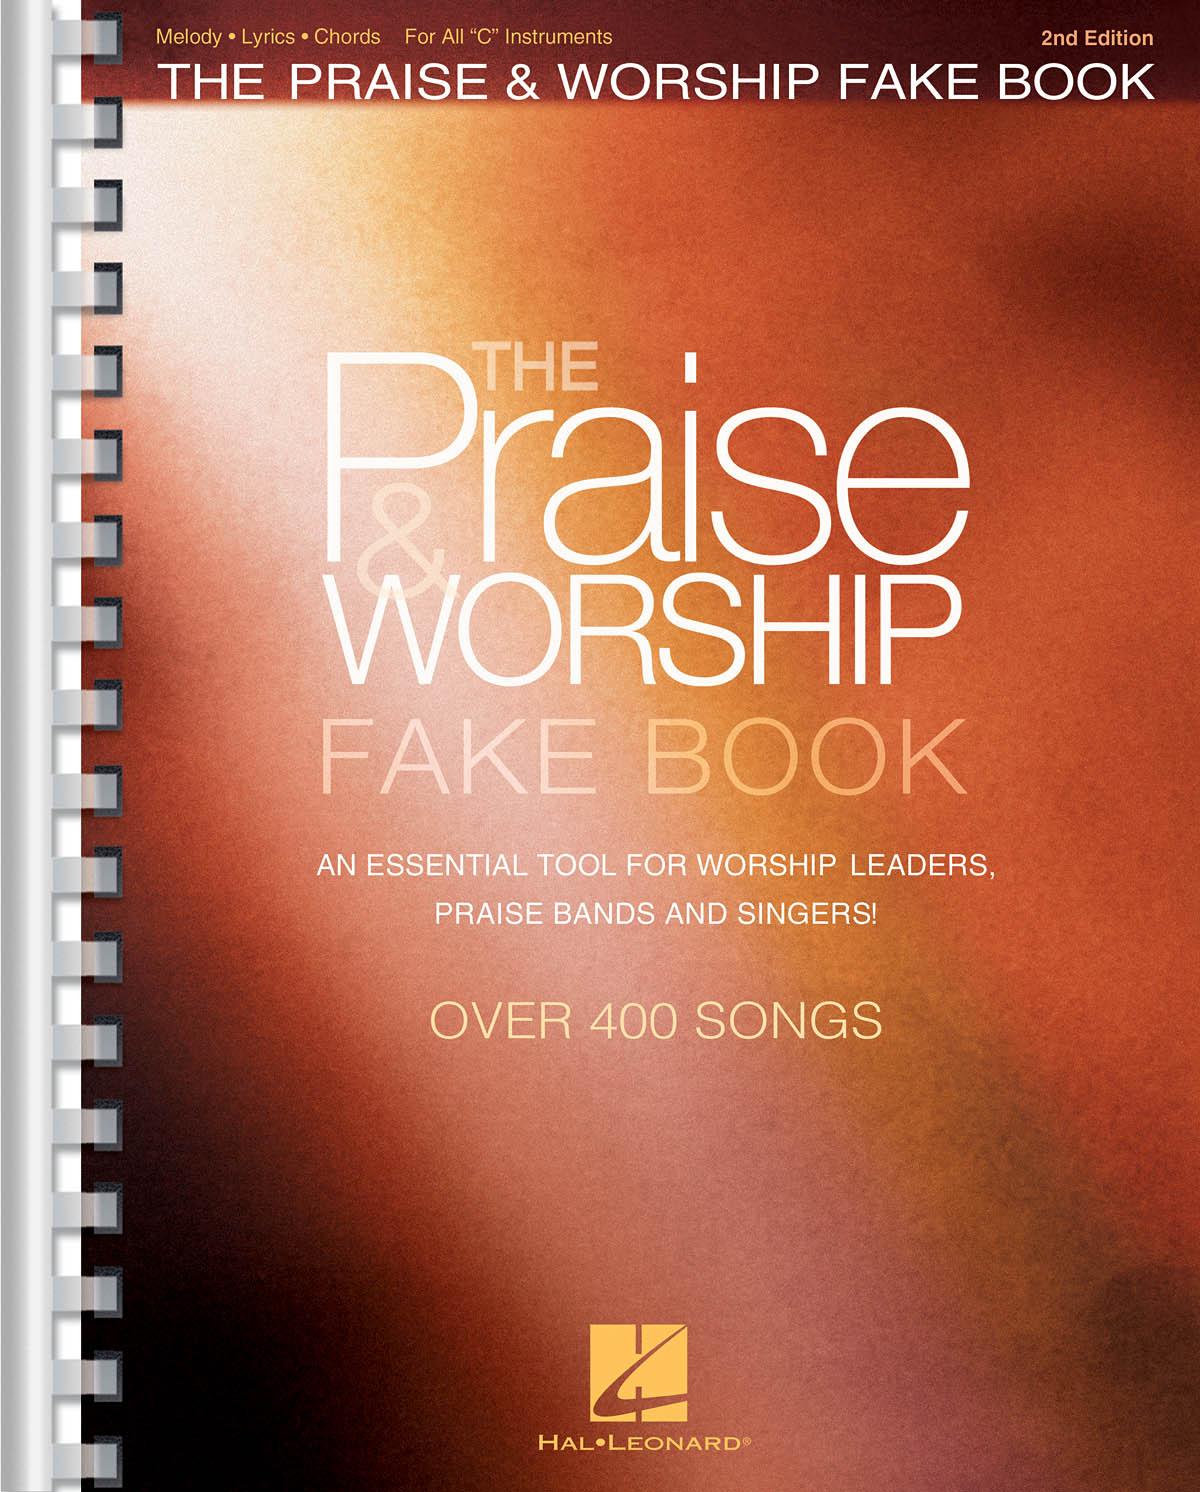 The Praise & Worship Fake Book - 2nd Edition: Melody  Lyrics and Chords: Mixed